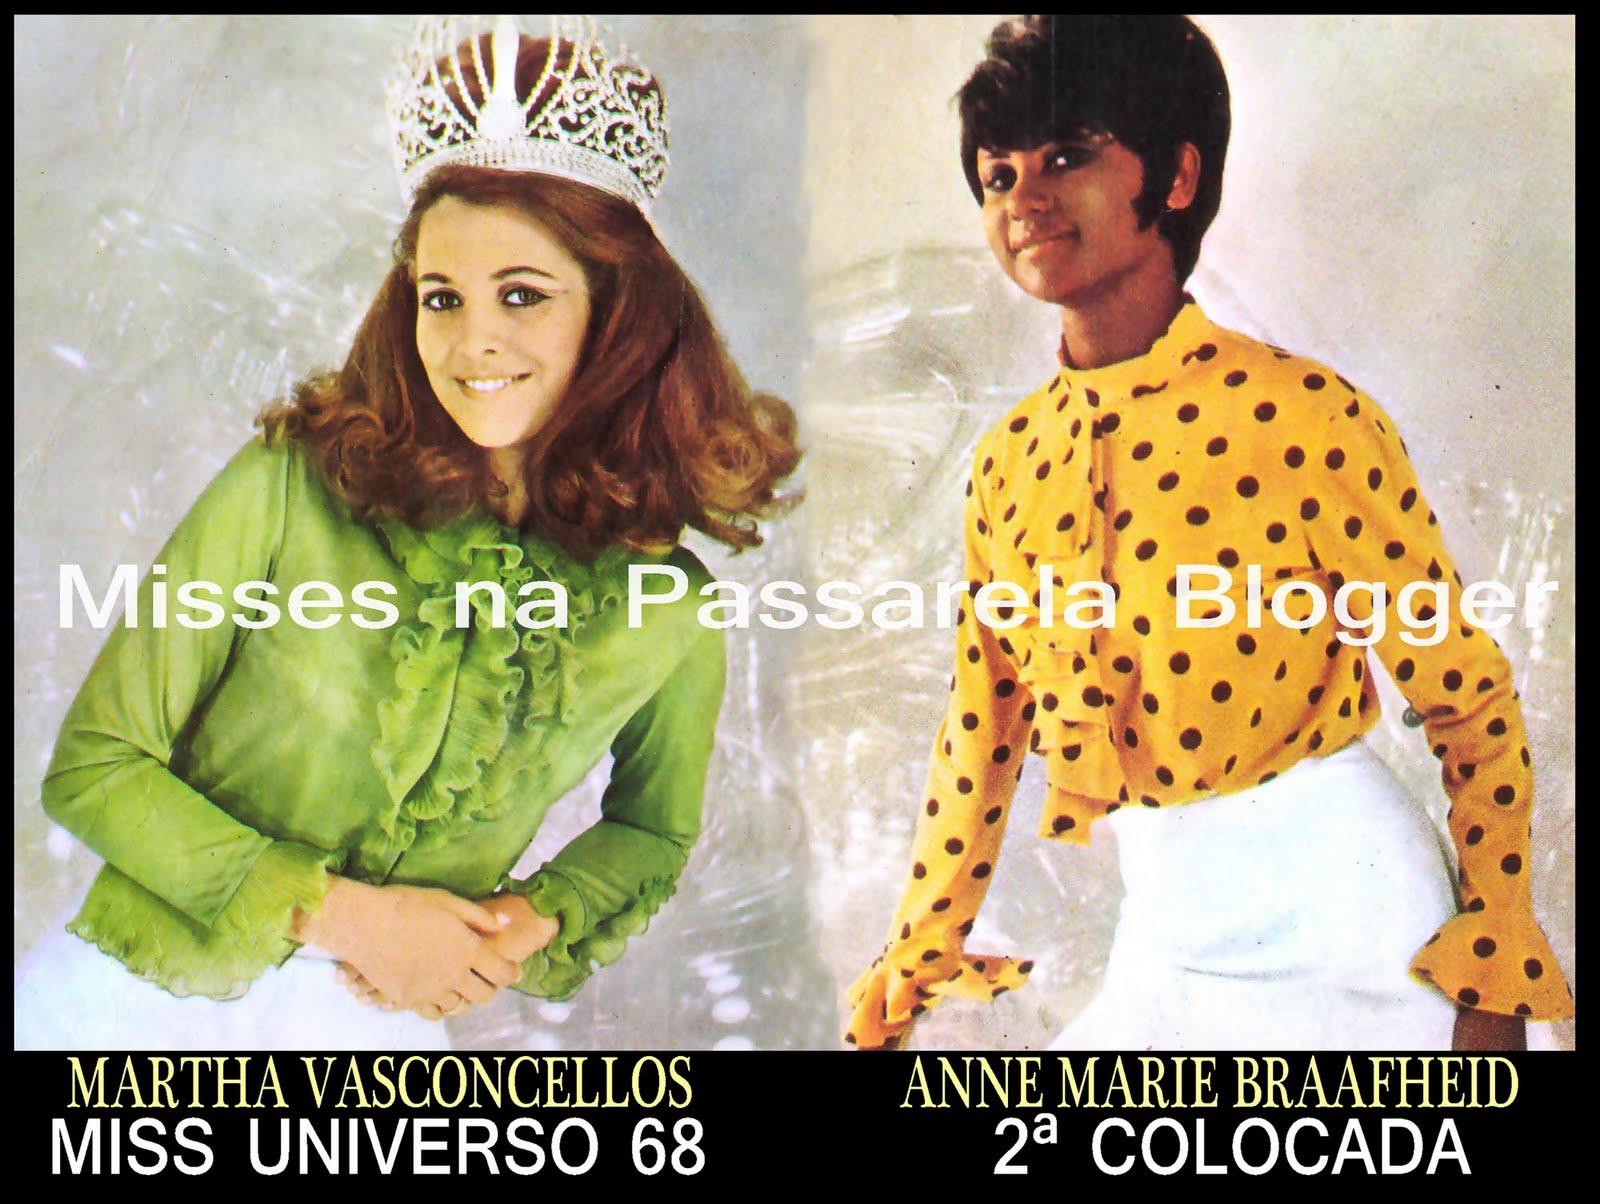 ☽ ✮ ✯ ✰ ☆ ☁ Galeria de Martha Vasconcelos, Miss Universe 1968.☽ ✮ ✯ ✰ ☆ ☁ Estrelas%2B68